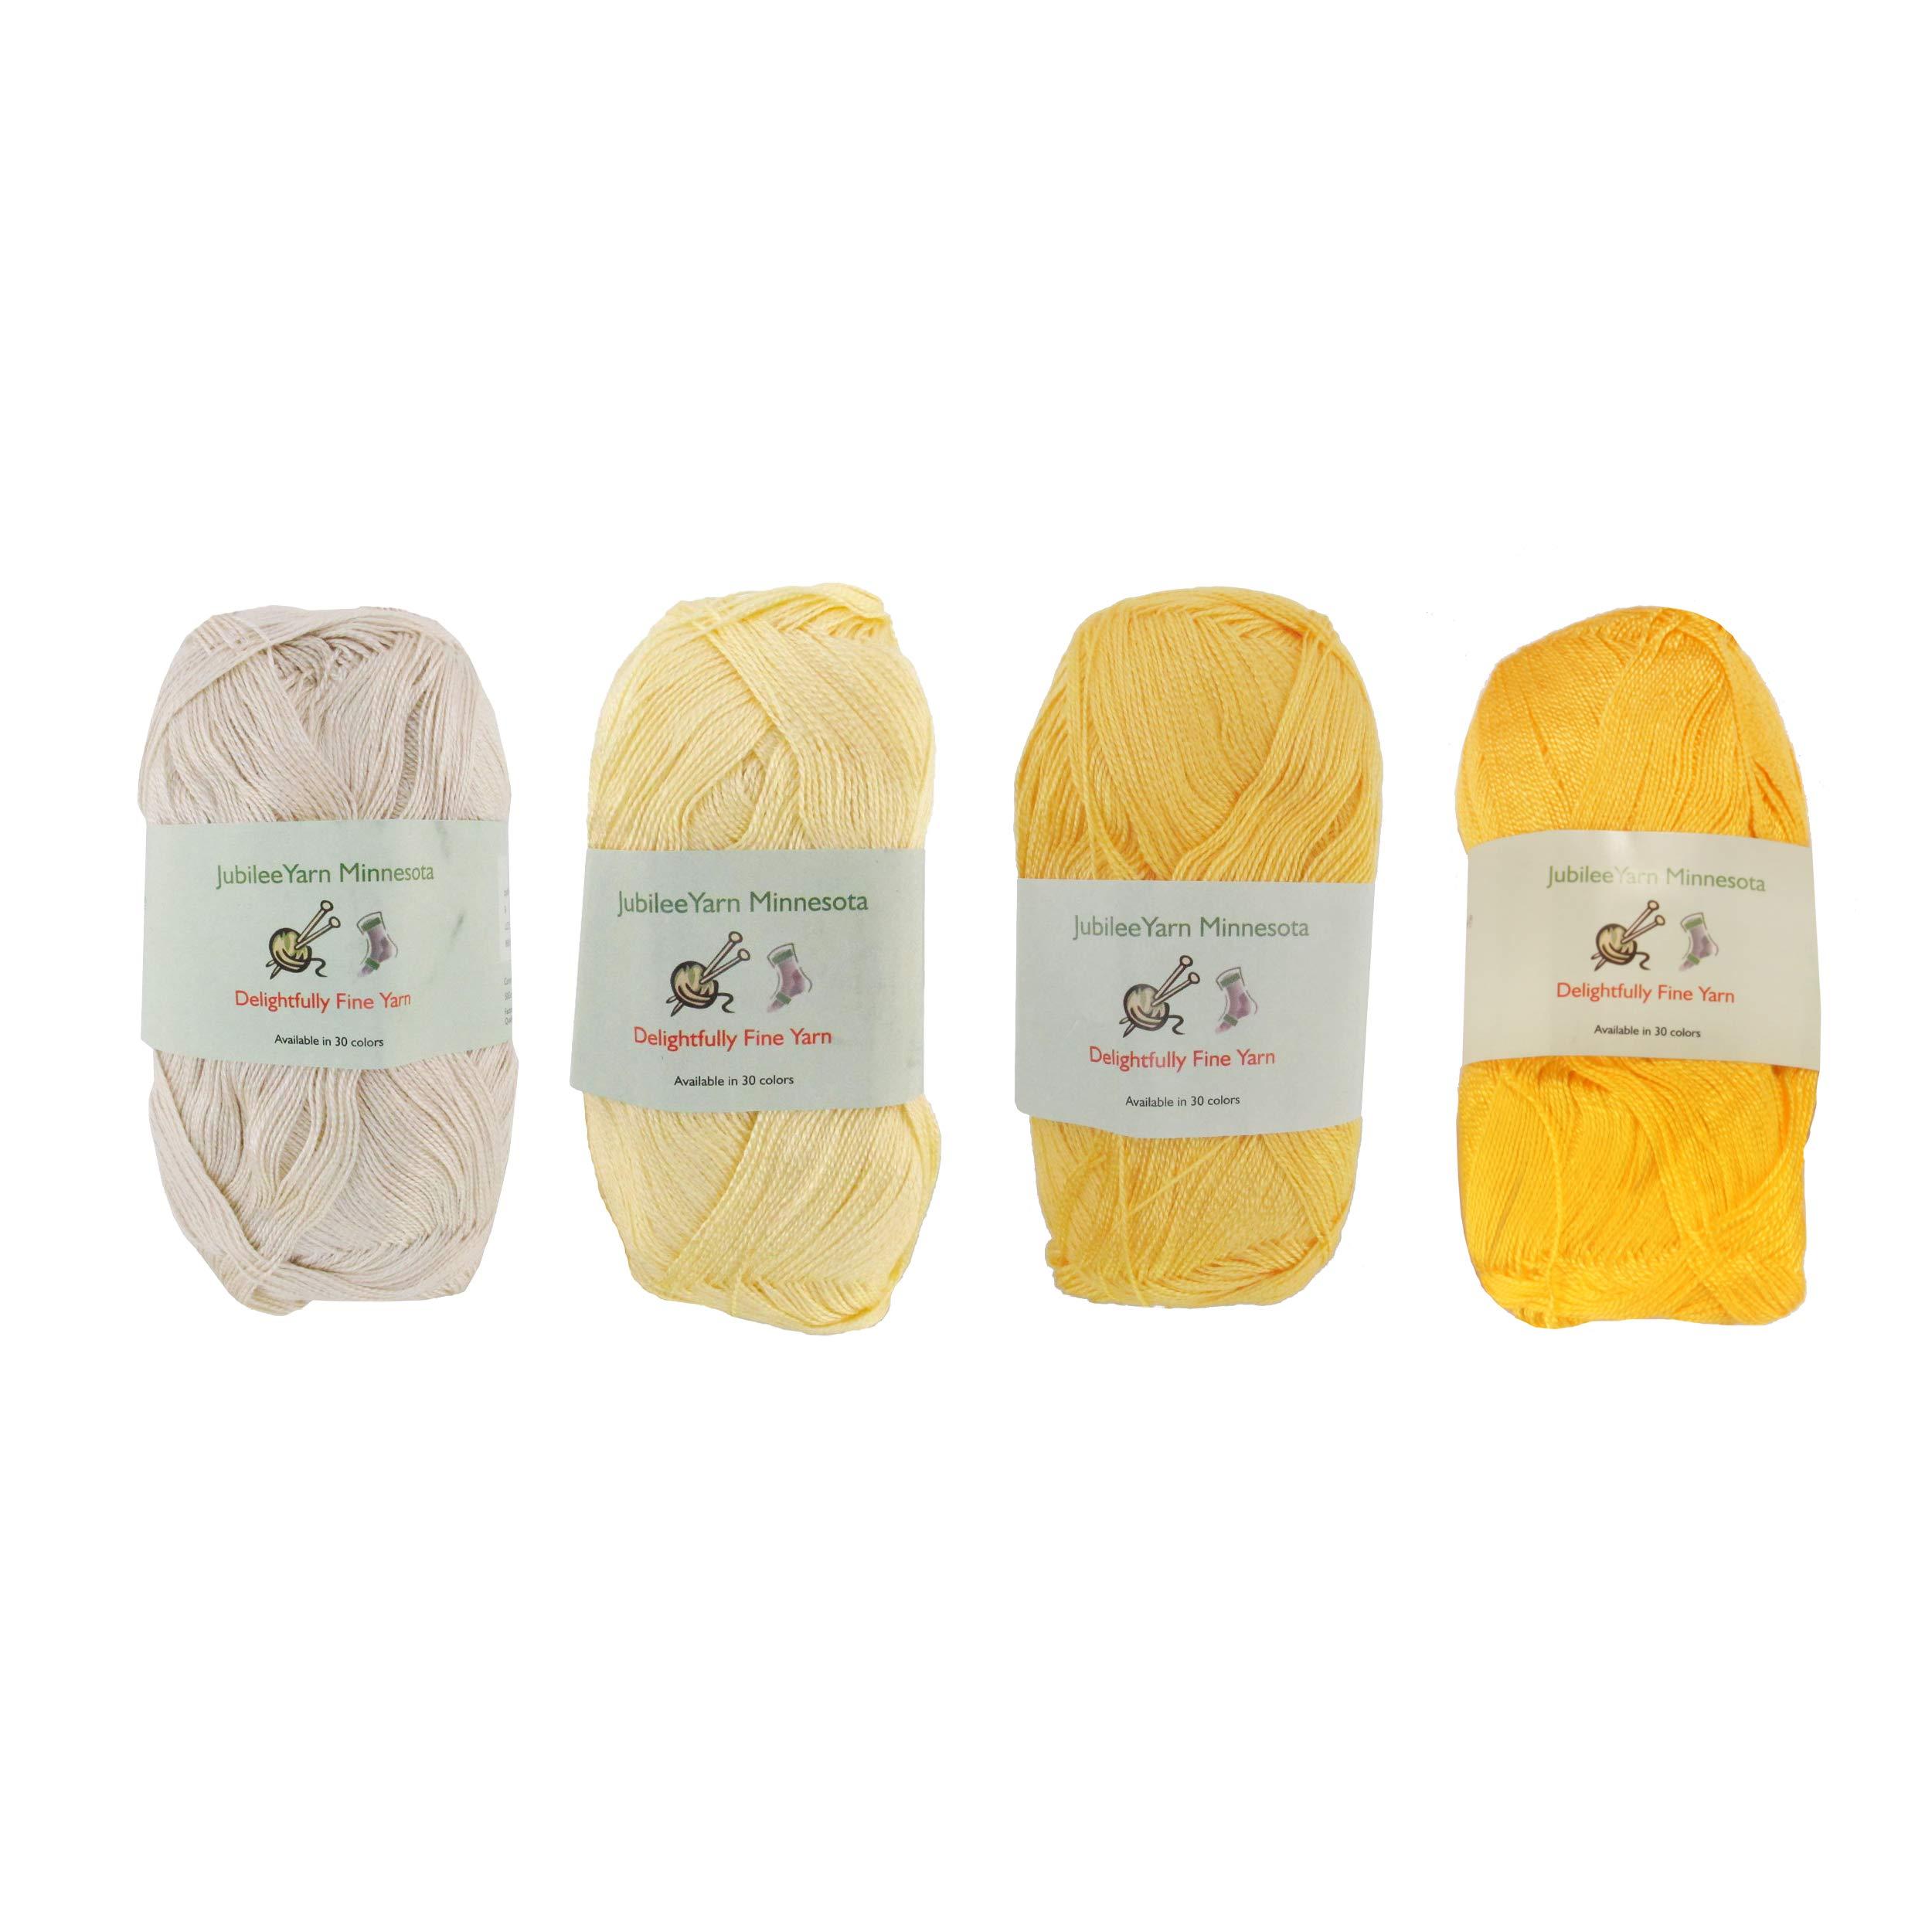 Lace Weight Tencel Yarn - Delightfully Fine - 60% Bamboo 40% Tencel Yarn - 4 Skeins - Shades of Yellow Assortment